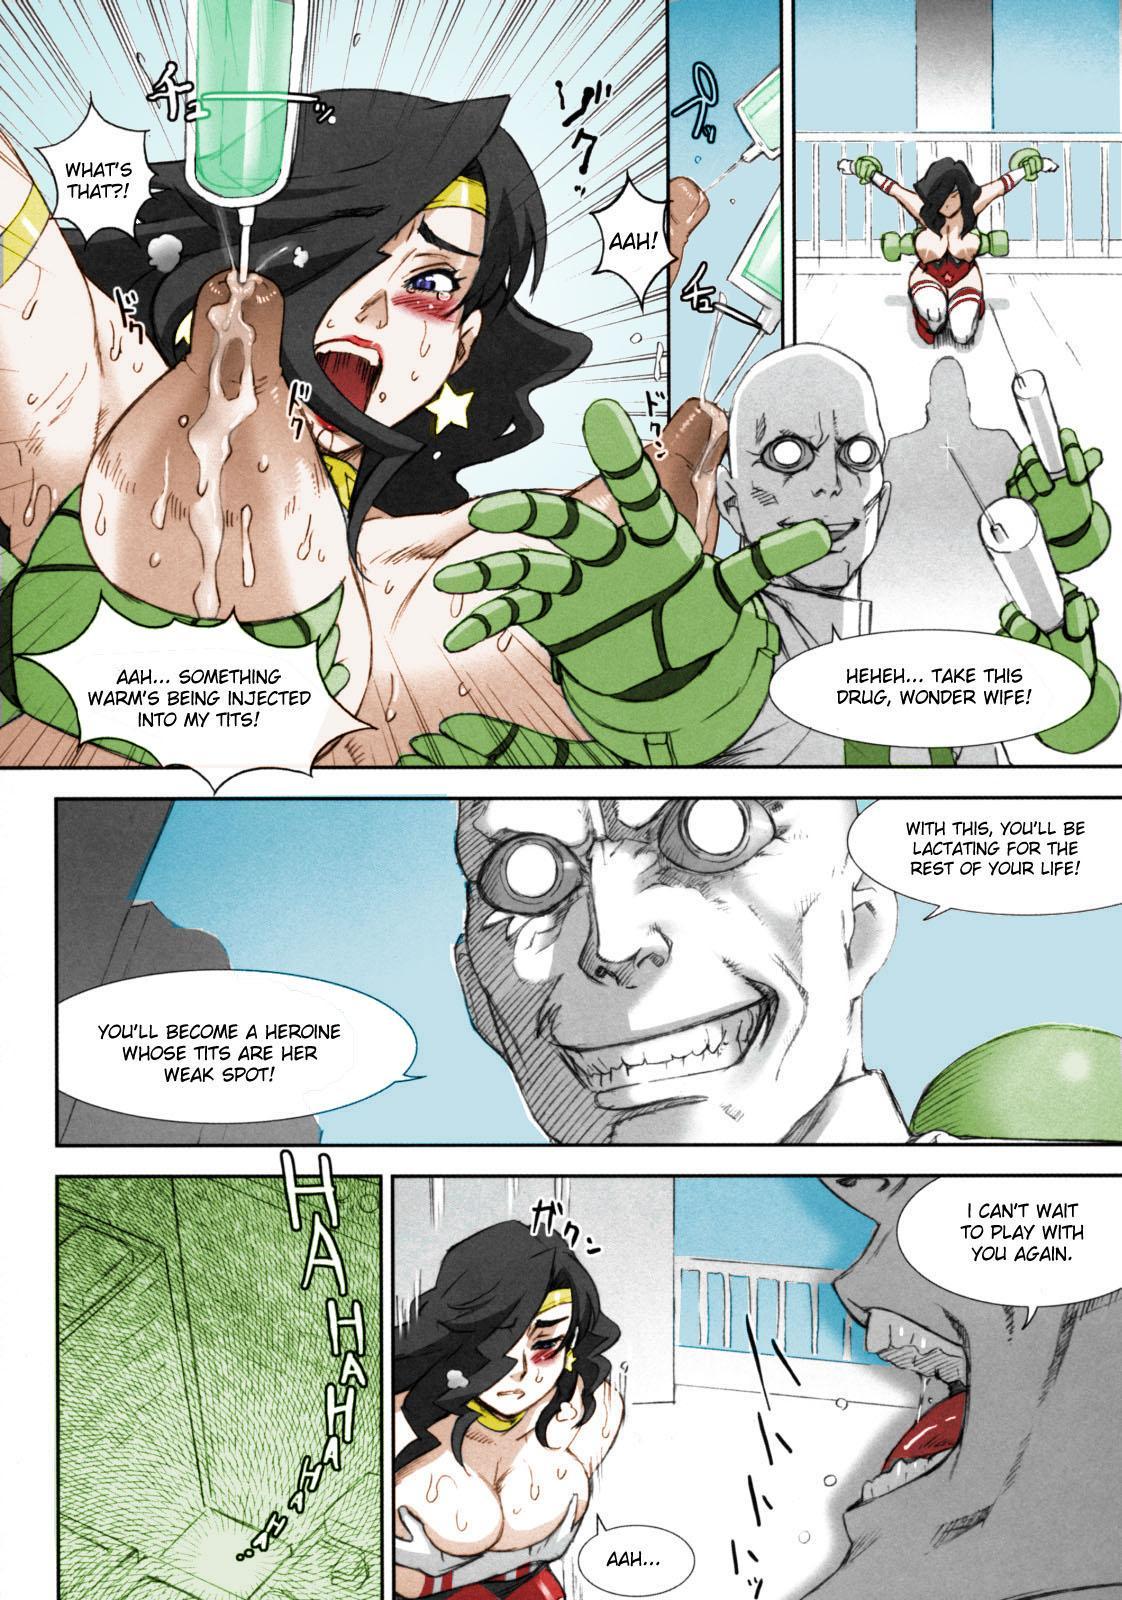 Wonder Wife: Boobs Crisis #21 11